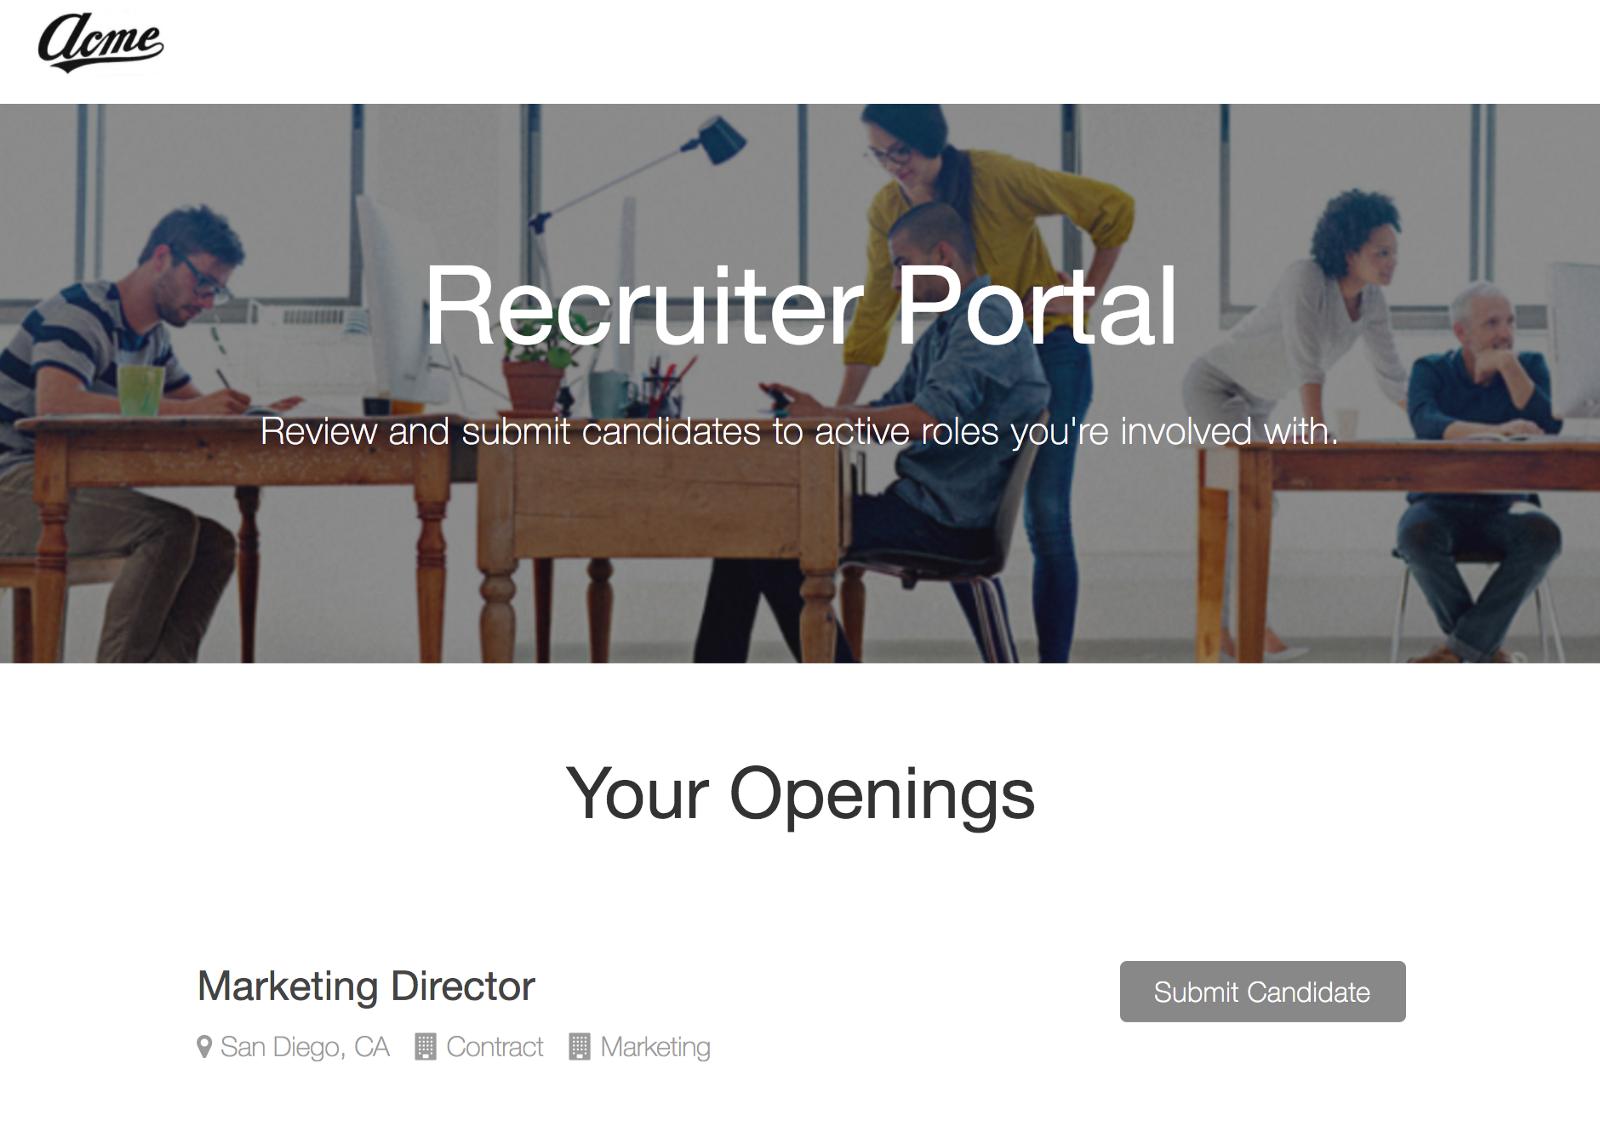 breezy recruiter portal